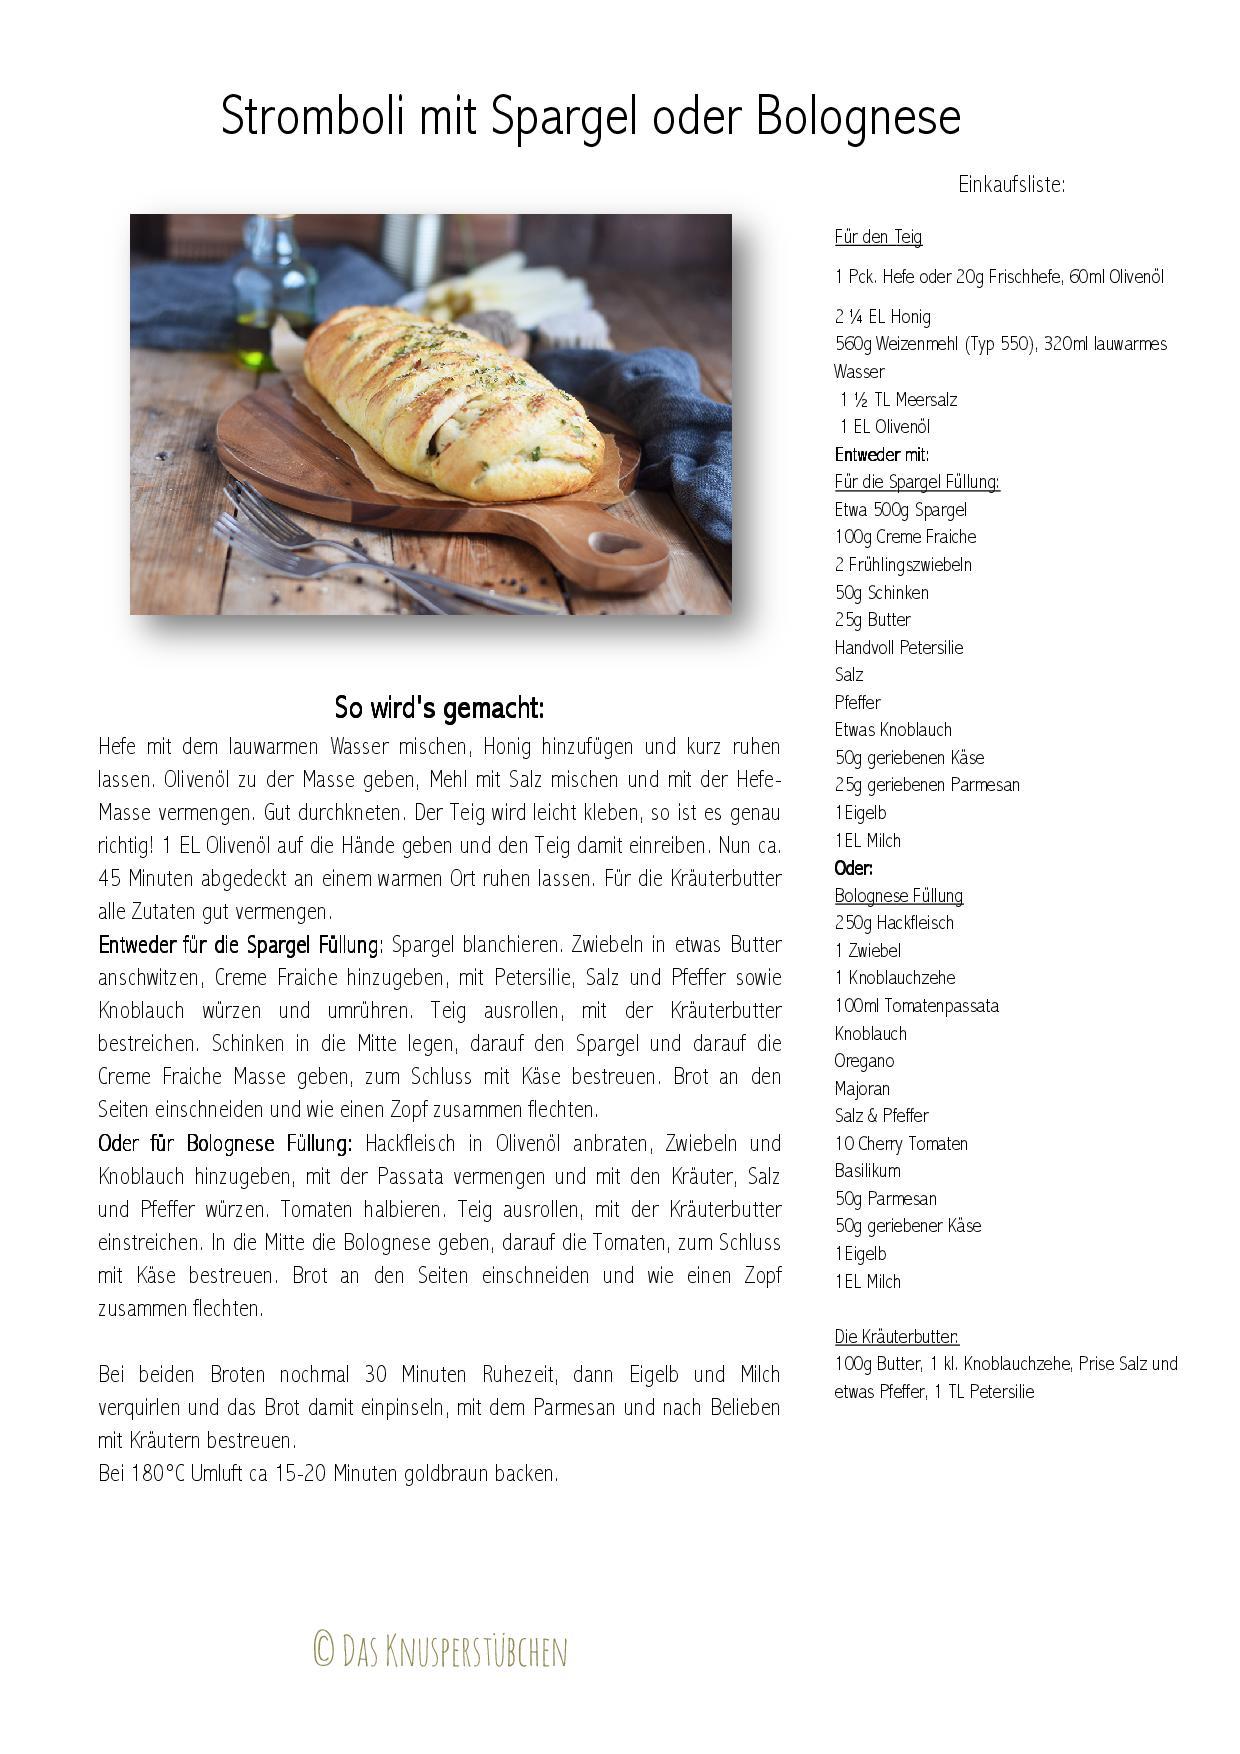 Stromboli Spargel oder Bolognese Rezept-001